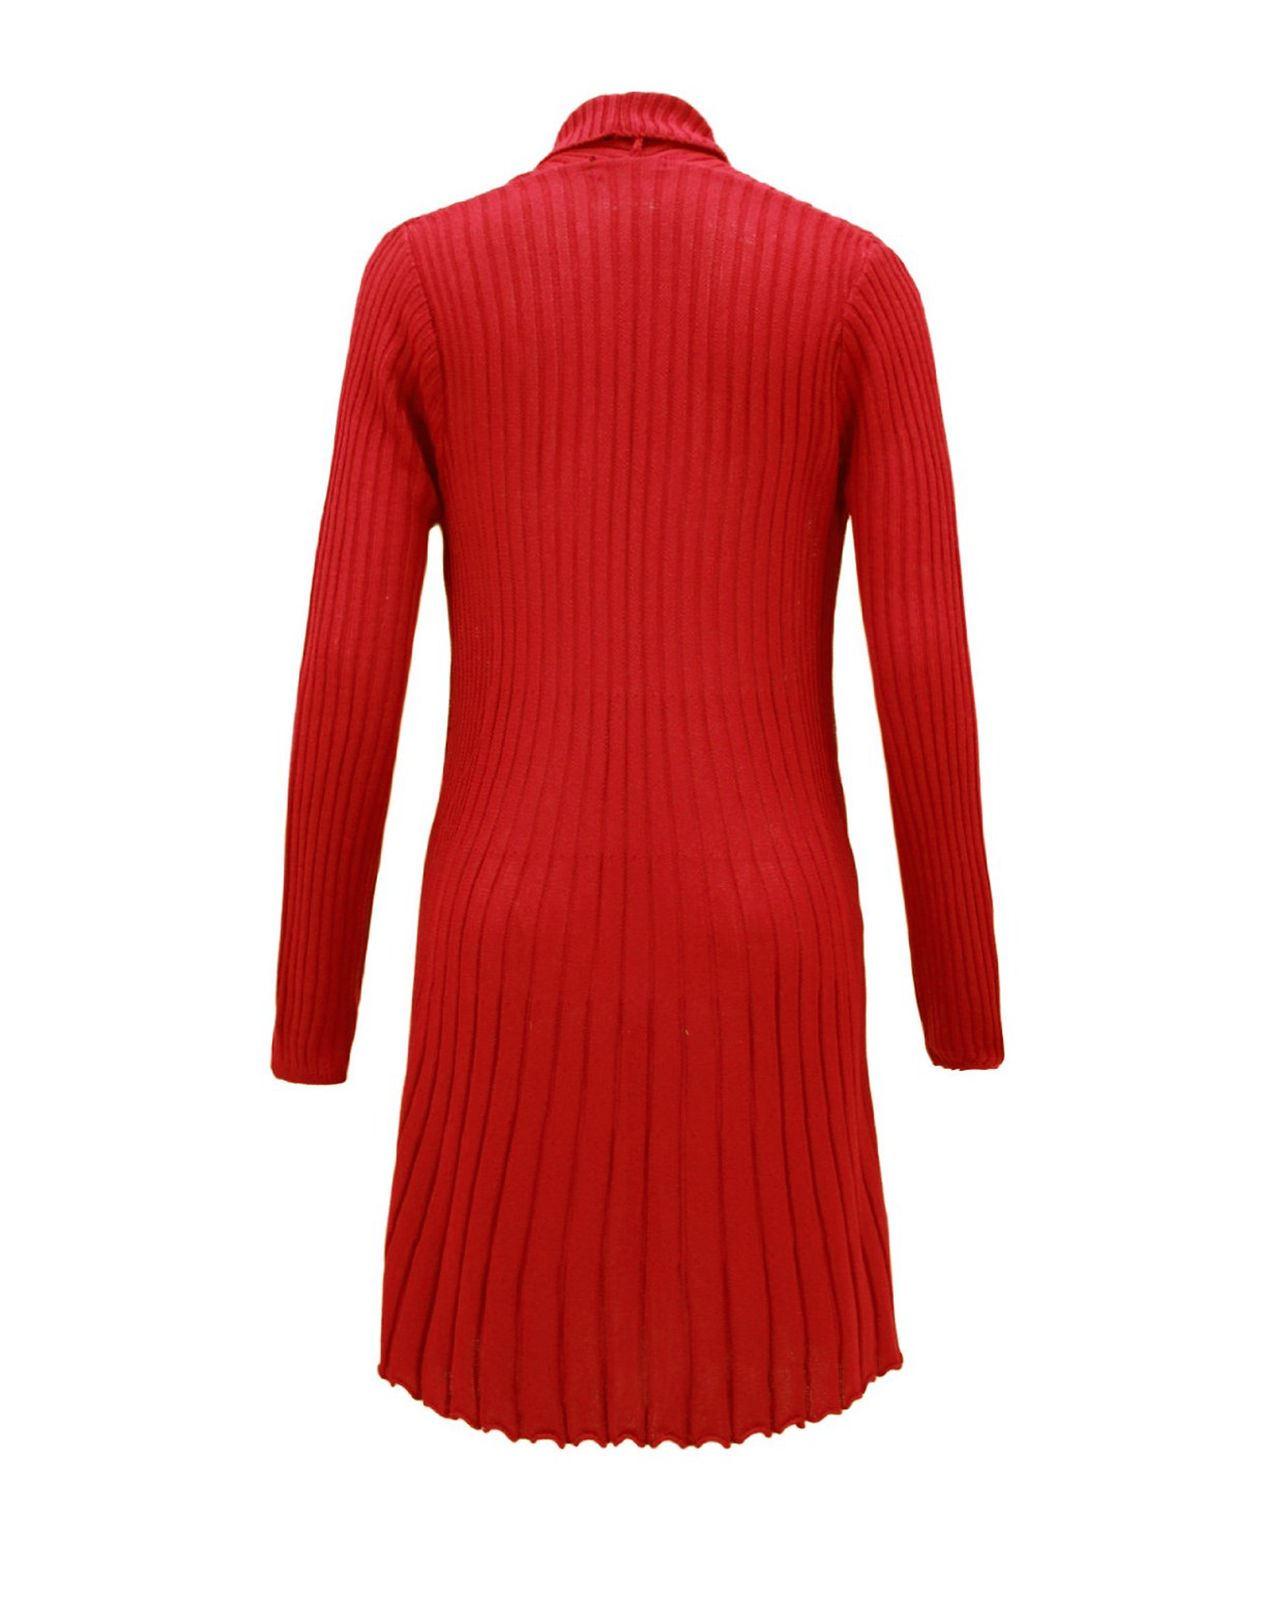 Ladies-Women-Knitted-Brooch-Boyfriend-Cardigan-Waterfall-Summer-Dress-Top-Jumper thumbnail 14